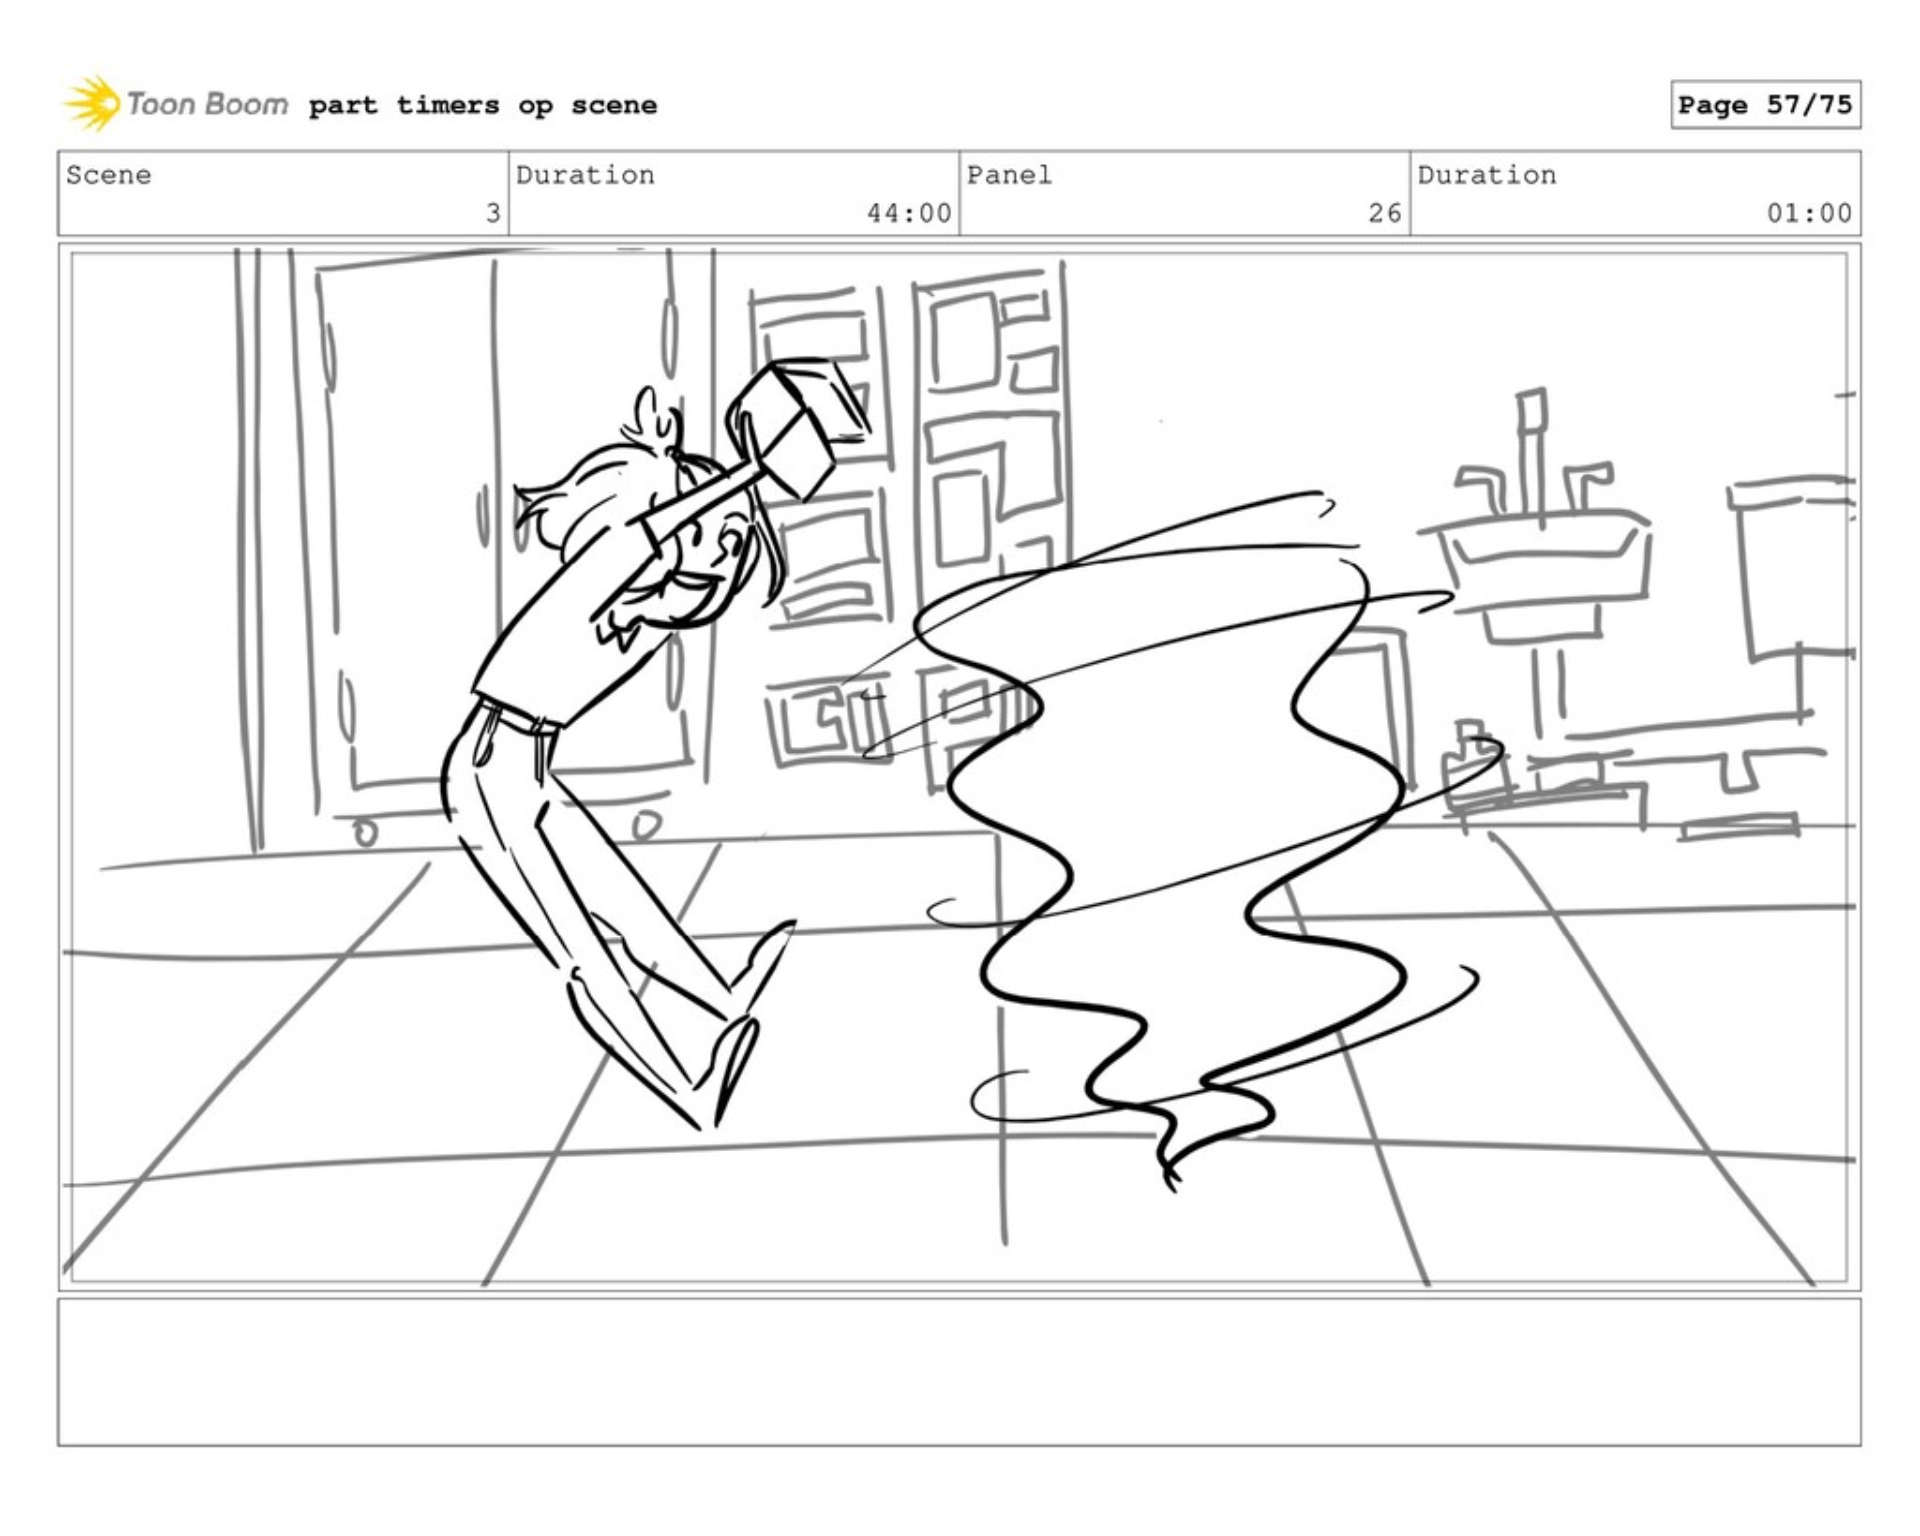 Scene 3 Duration 44:00 Panel 26 Duration 01:00 ...